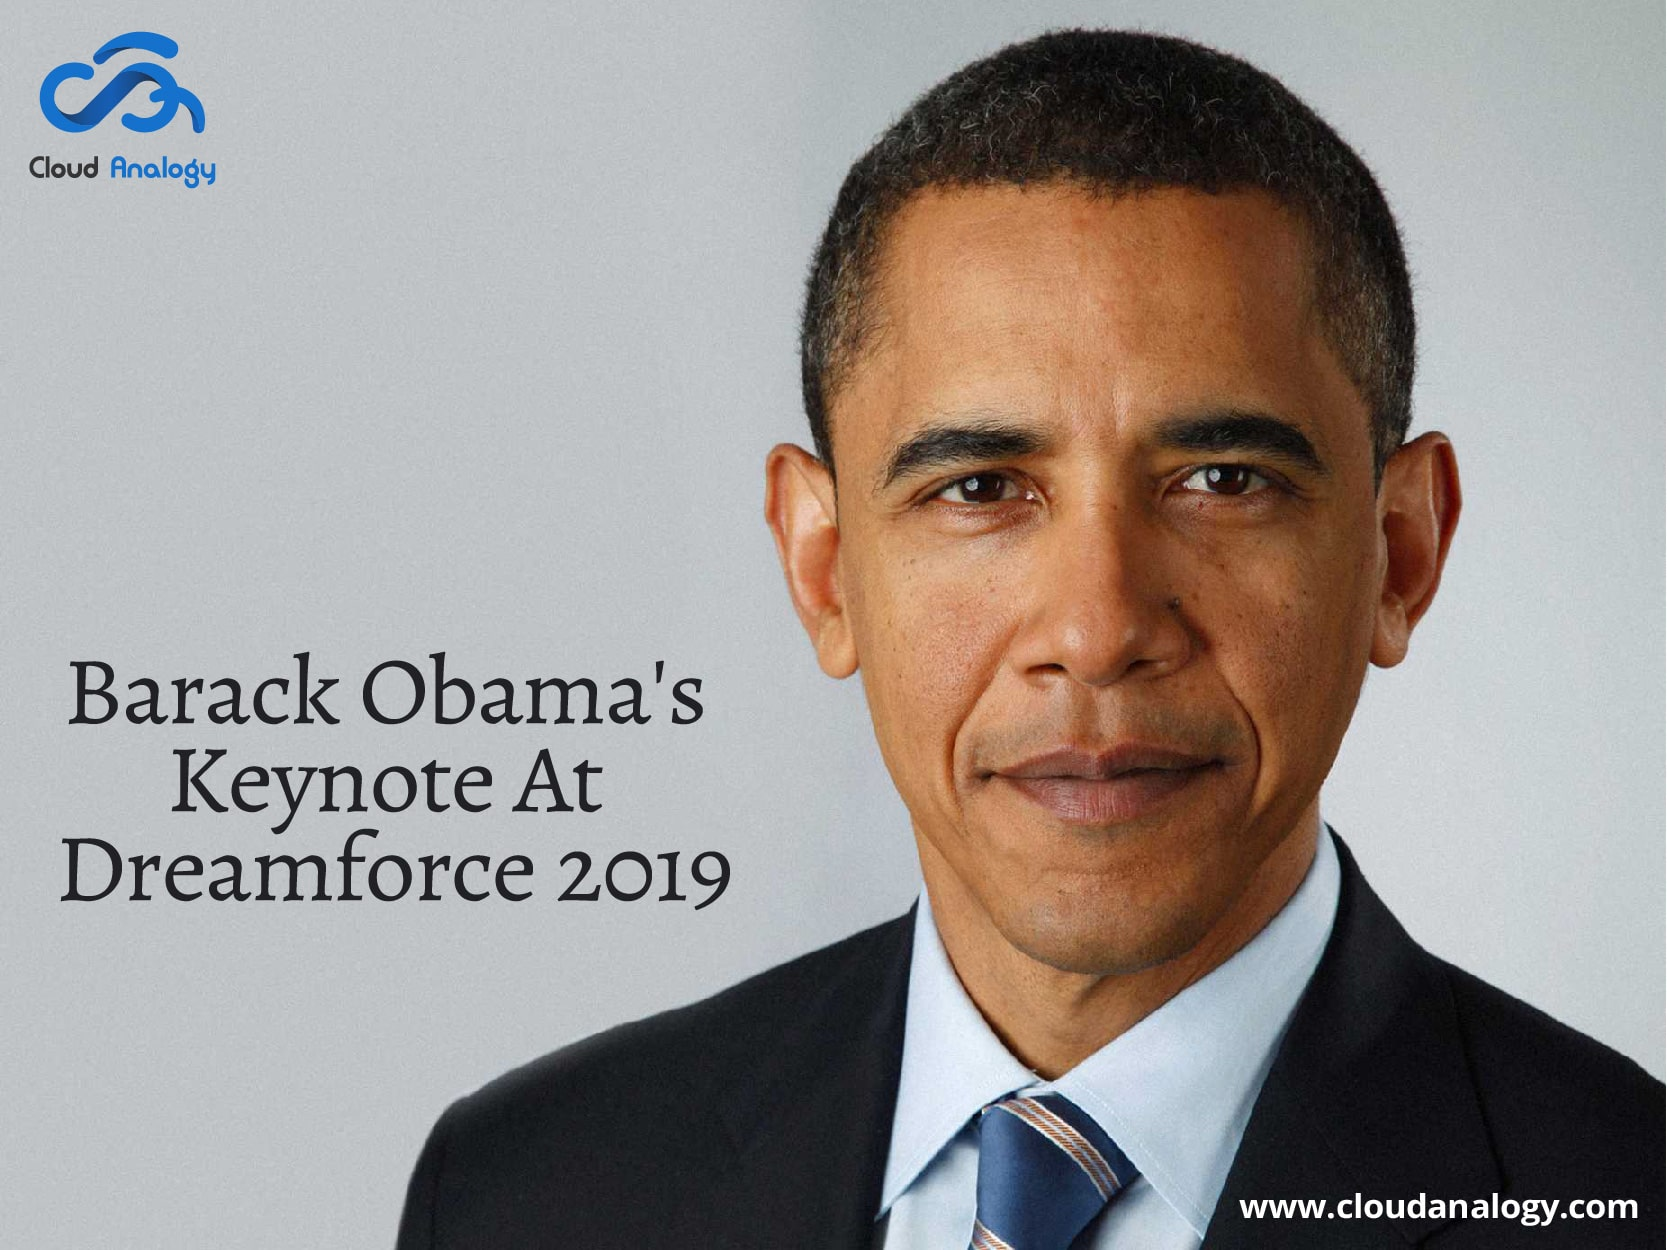 Barack Obama's Keynote at Dreamforce 2019